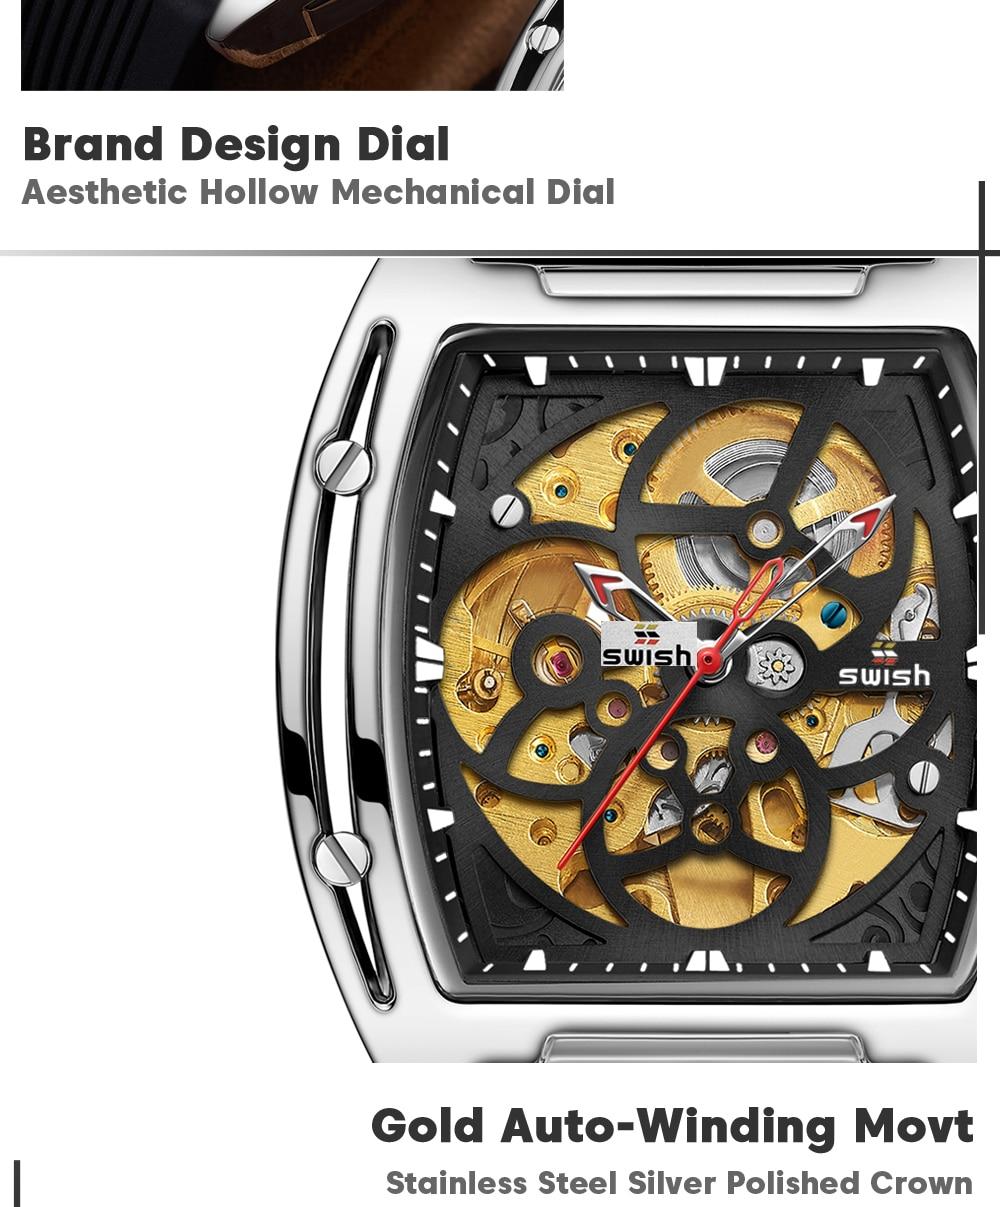 Hf480576a26b8440cb6ee4c07ce22f50bD SWISH Brand Design Luxury Men's Mechanical Wristwatch